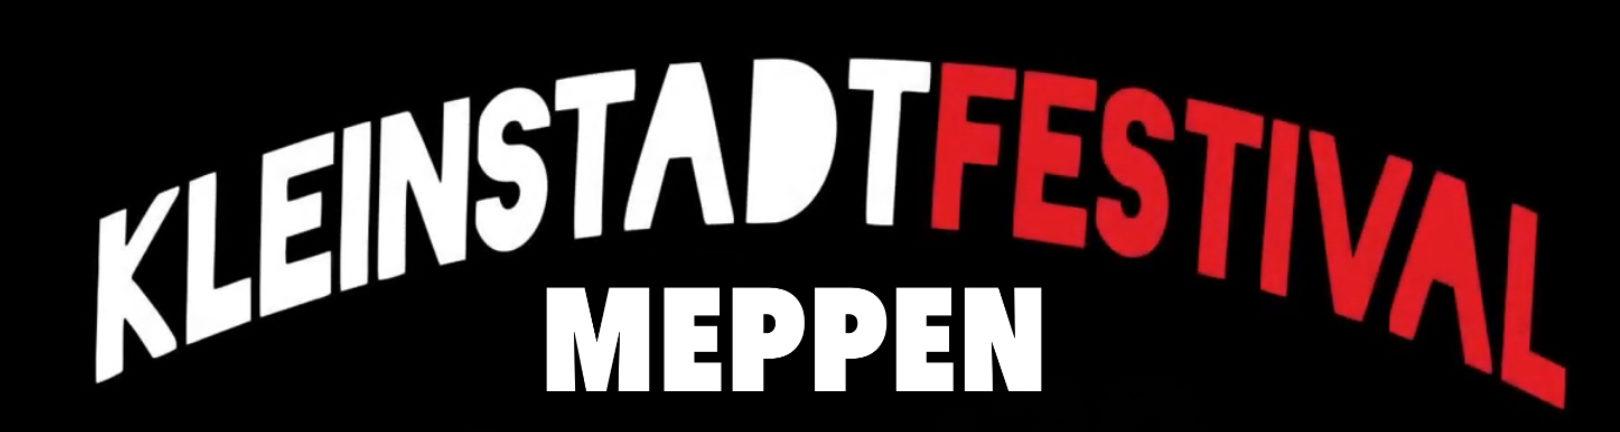 Kleinstadtfestival Meppen